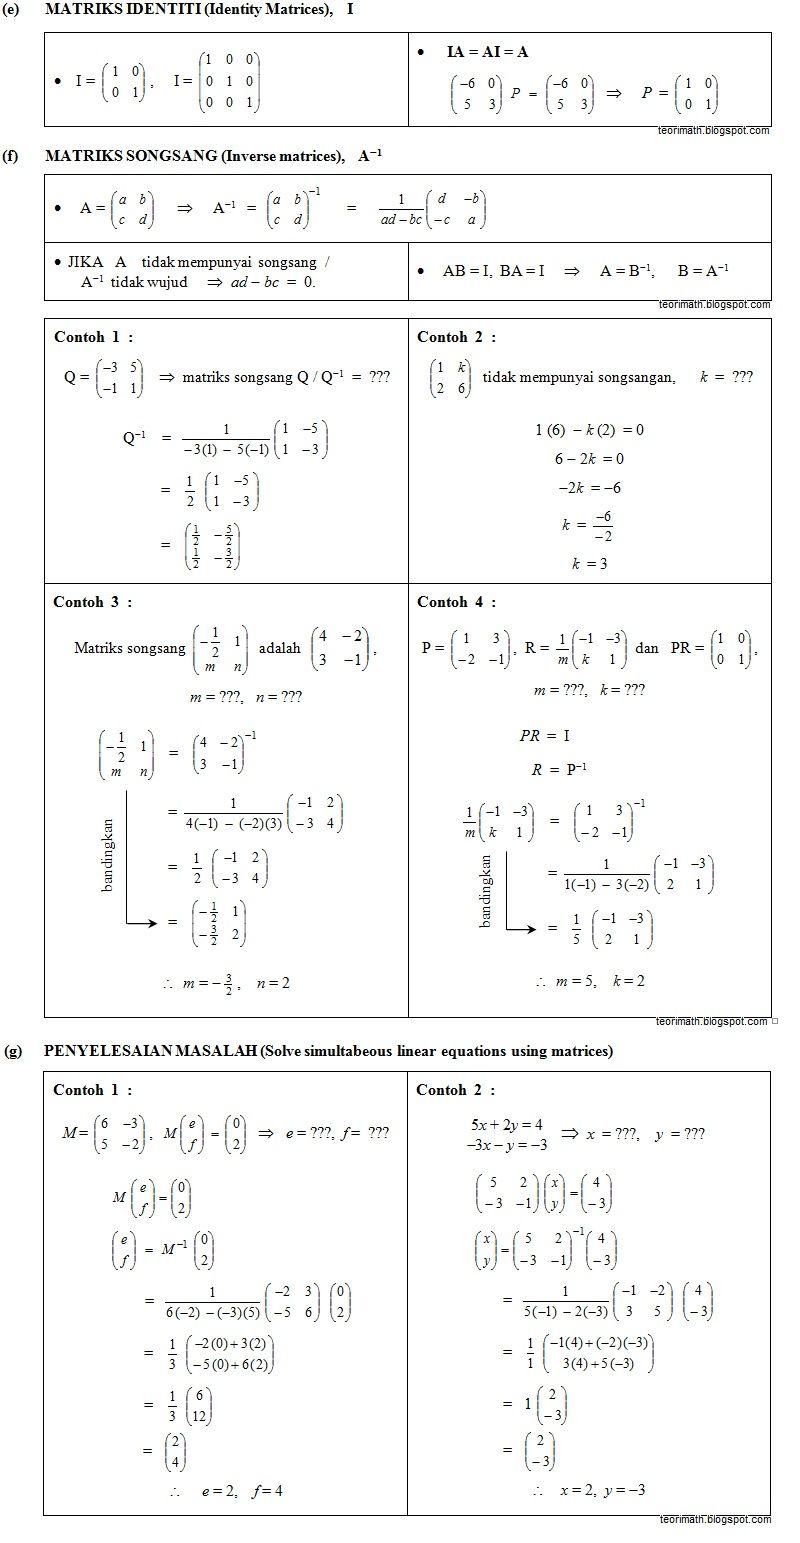 26 Matriks Matrices Matematika Kelas 5 Buku Catatan Matematika Kalkulus